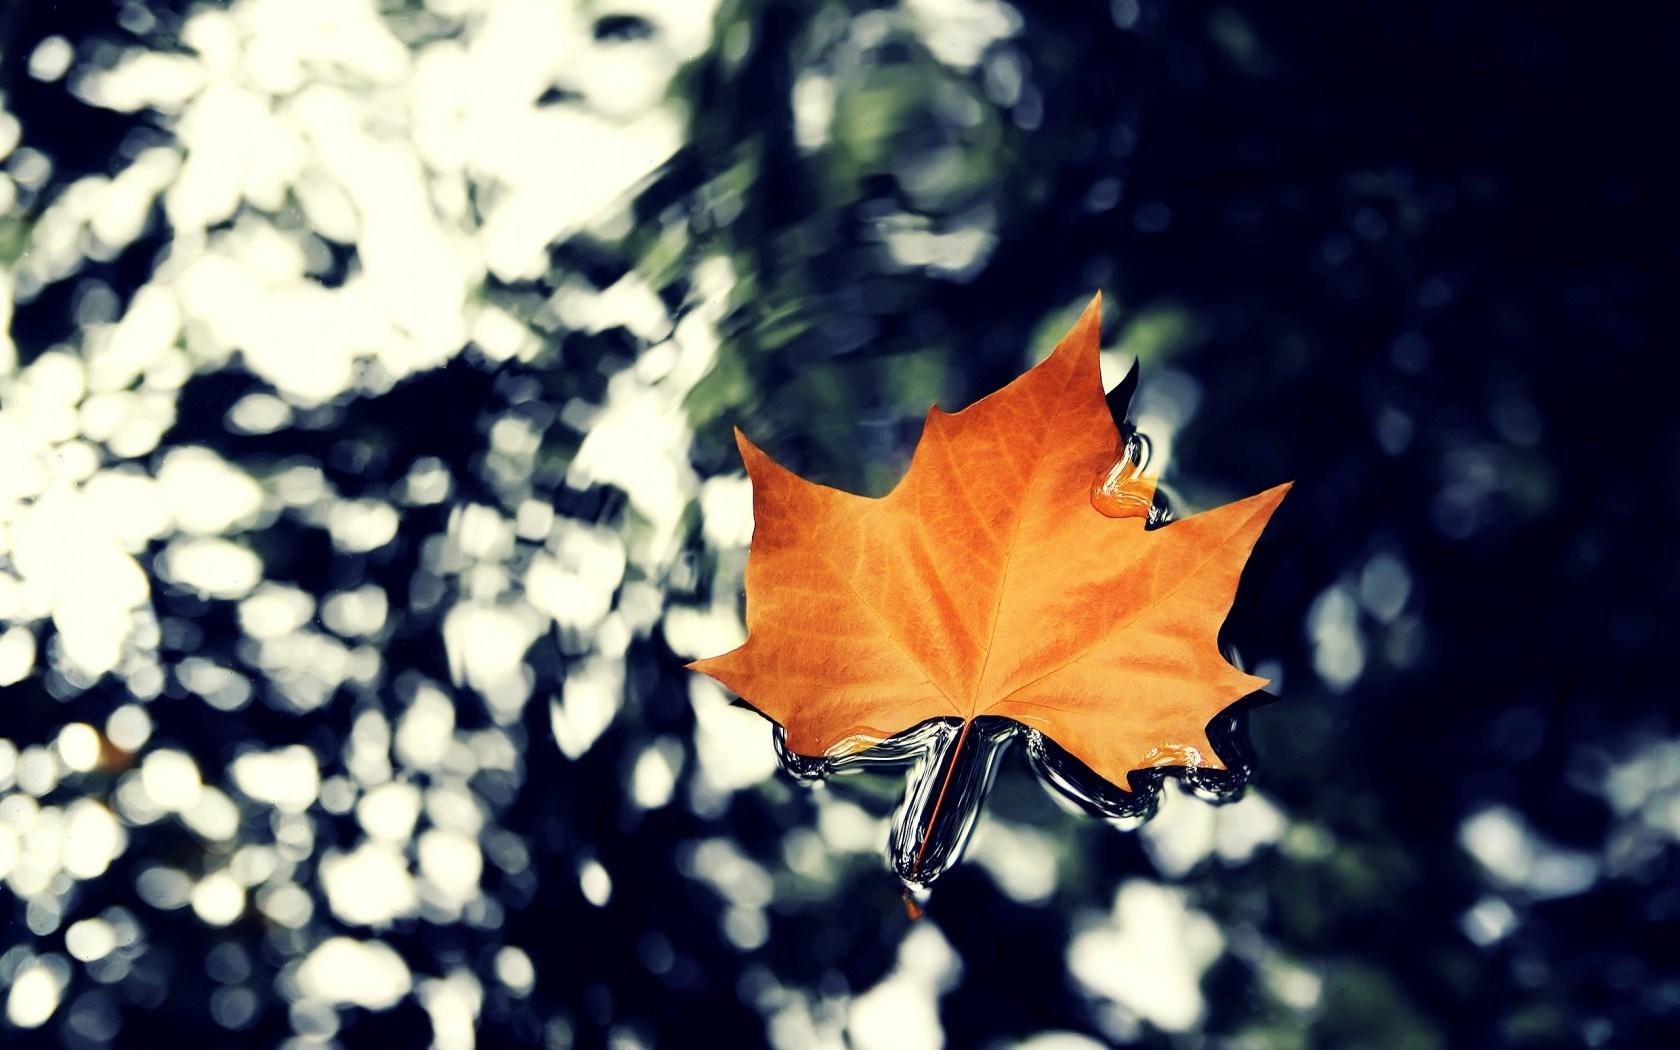 Water Falling Leaves Live Wallpaper Download Autumn Leaf Nature Stunning Hd Desktop Wallpapers 4k Hd